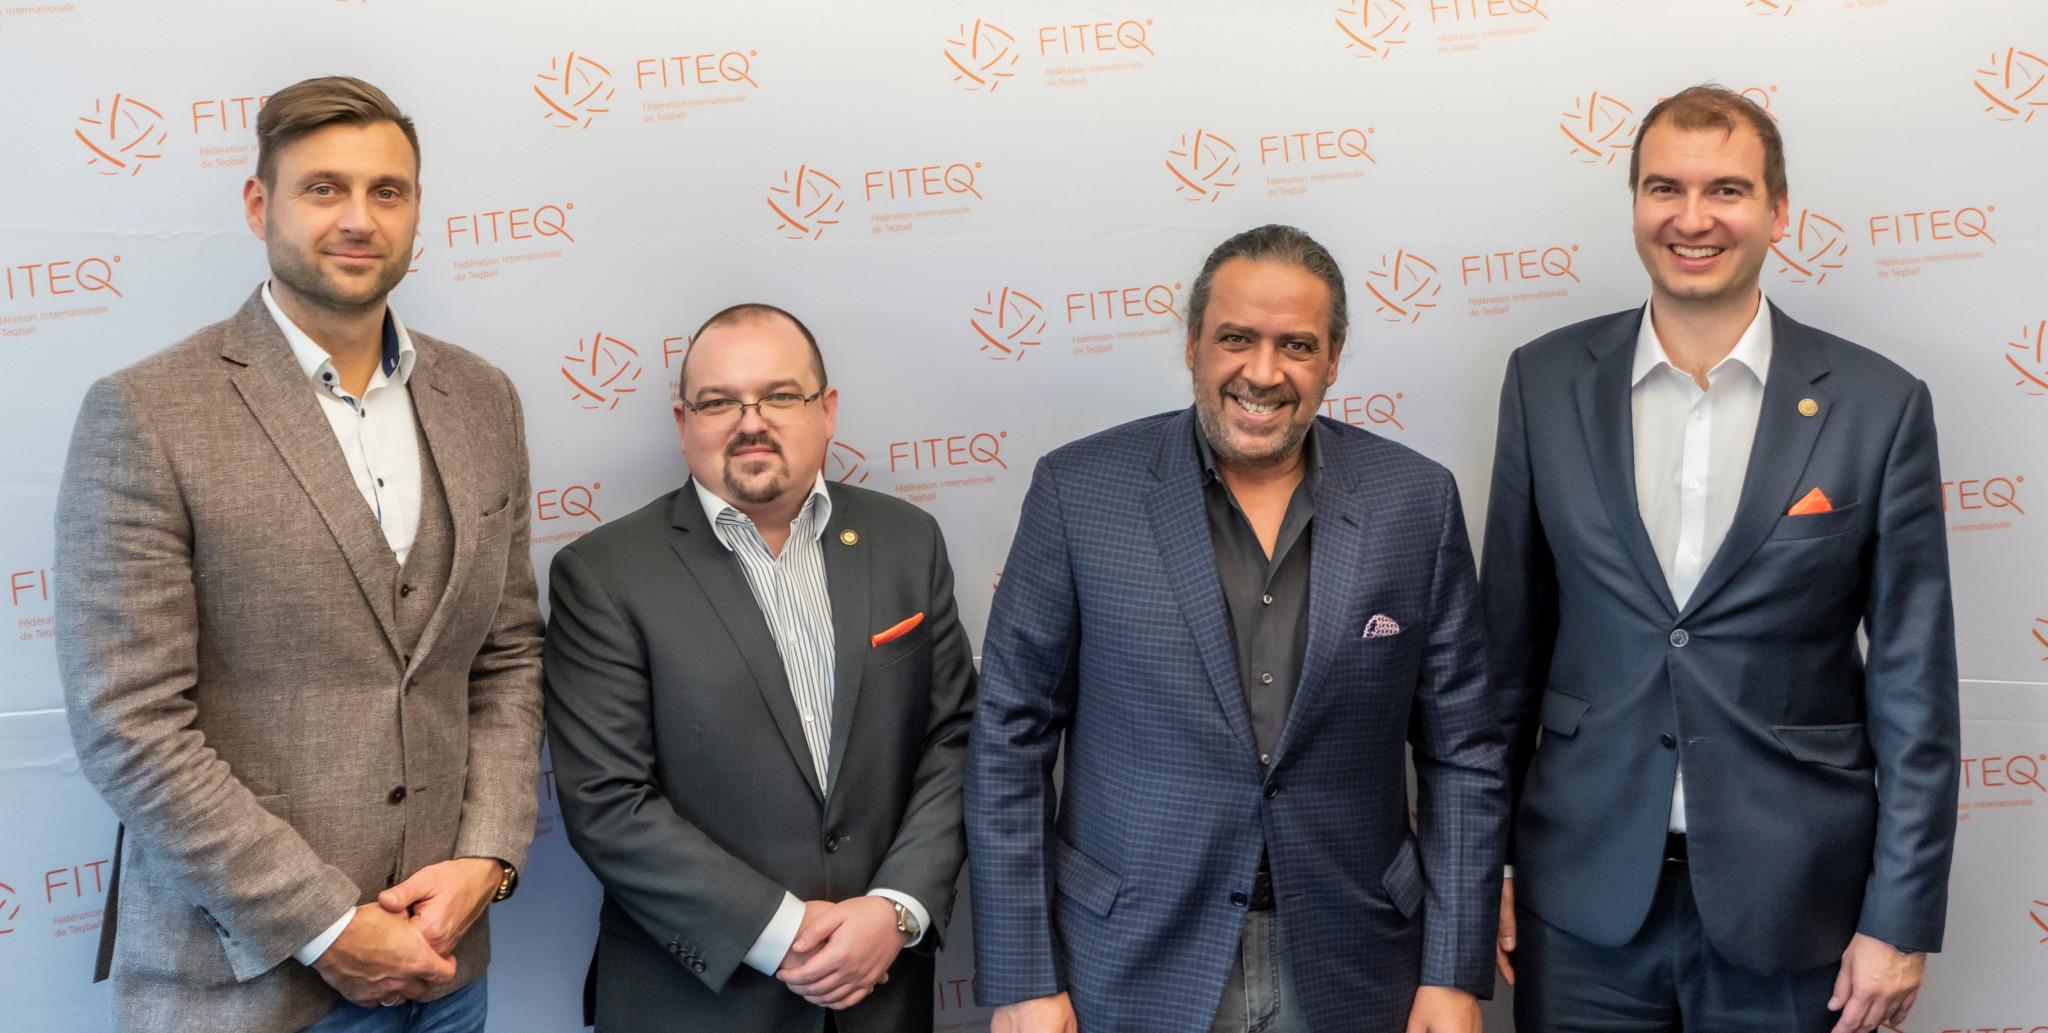 Gabor Borsányi, Marius Vizer Jr, Sheikh Ahmad Al-Fahad Al-Sabah and Viktor Huszar have held talks at the FITEQ headquarters in Budapest ©FITEQ